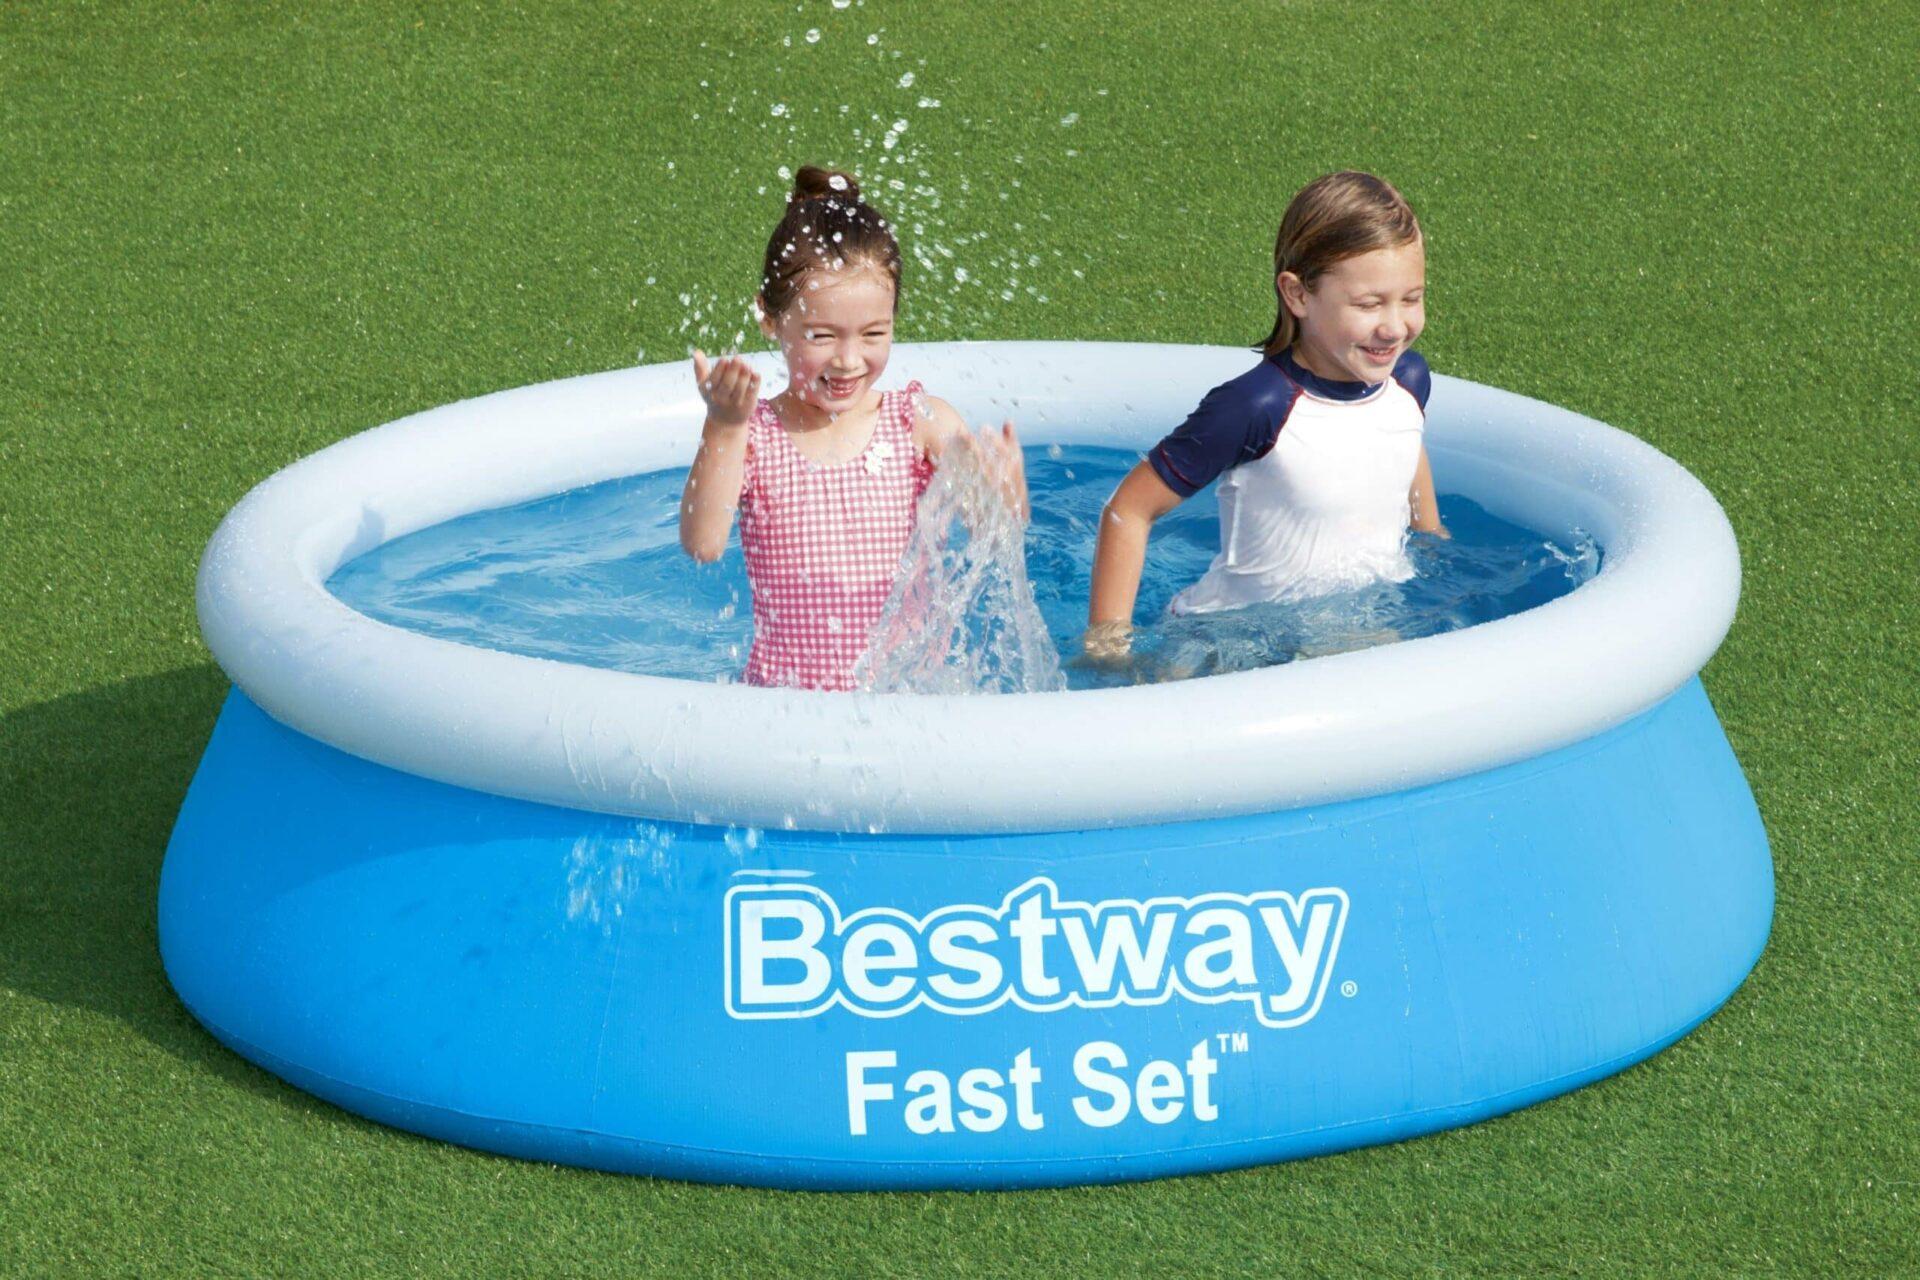 Rundt Bestway Fast barnebasseng til barna